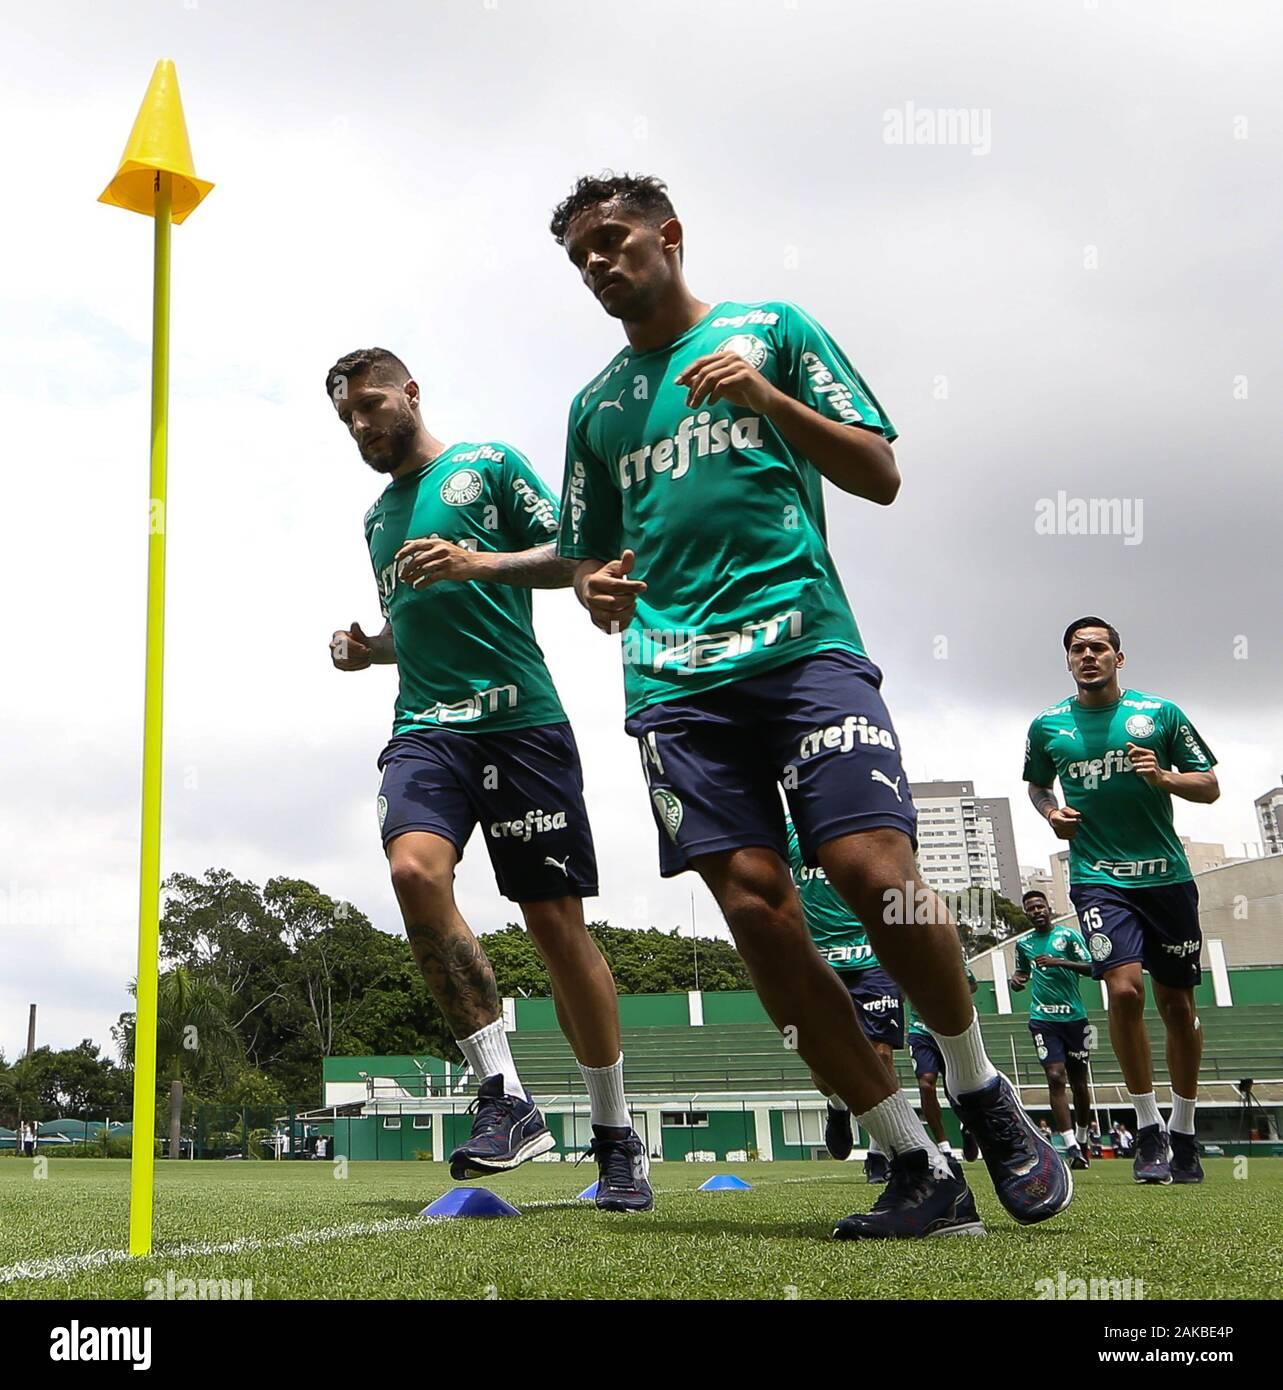 SÃO PAULO, SP - 08.01.2020: TREINO DO PALMEIRAS - Zé Rafael and Gustavo Scarpa (D) players from SE Palmeiras during training at the Football Academy. (Photo: Cesar Greco/Fotoarena) Stock Photo